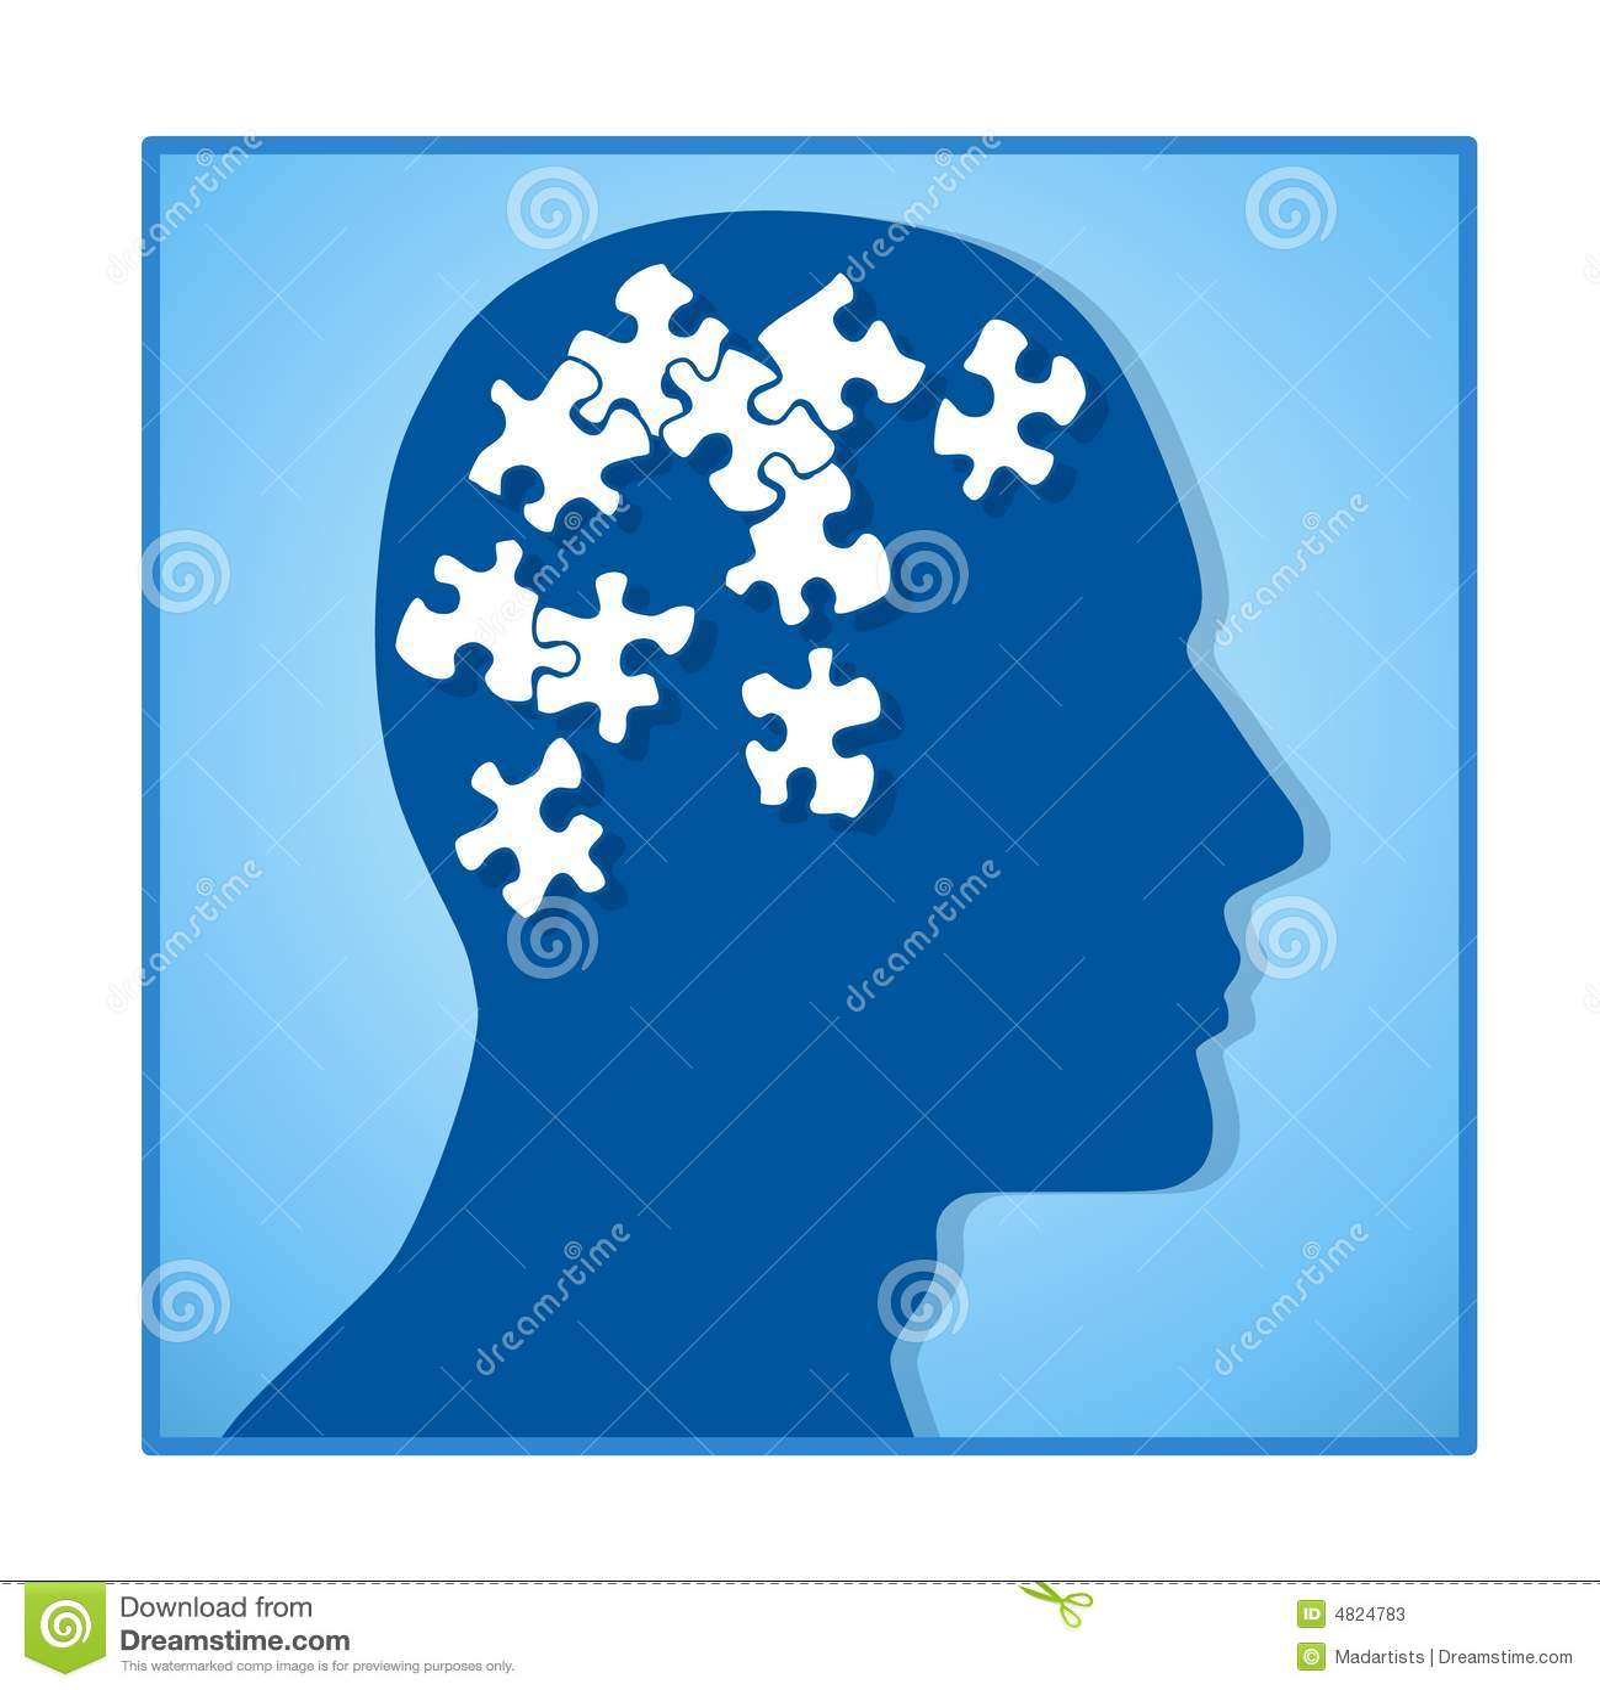 Brain as Puzzle Pieces In Head